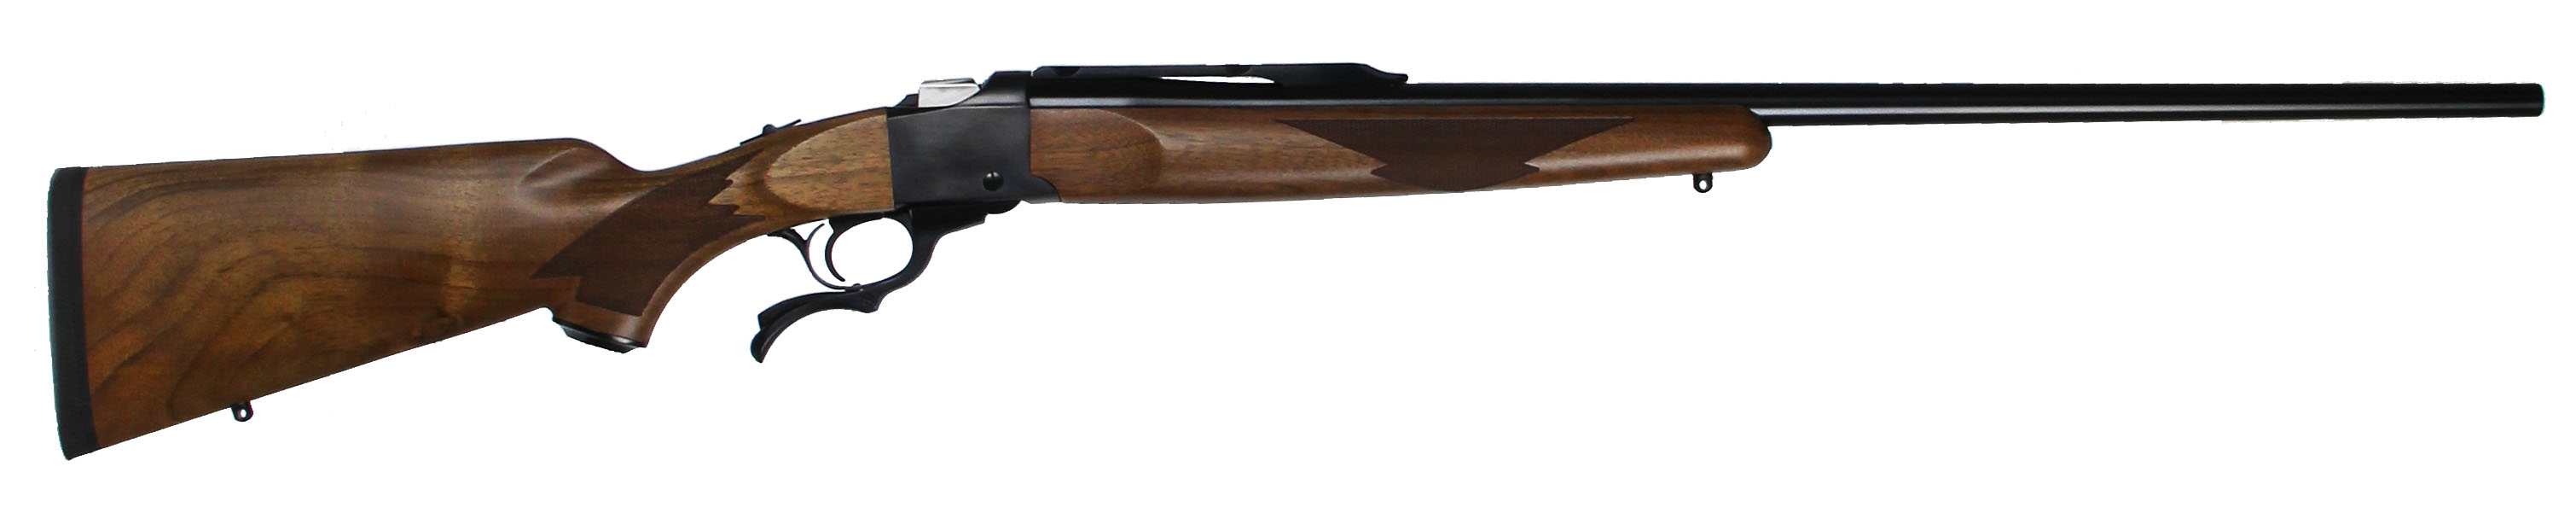 Ruger No. 1B Sporter 6.5 Creedmoor